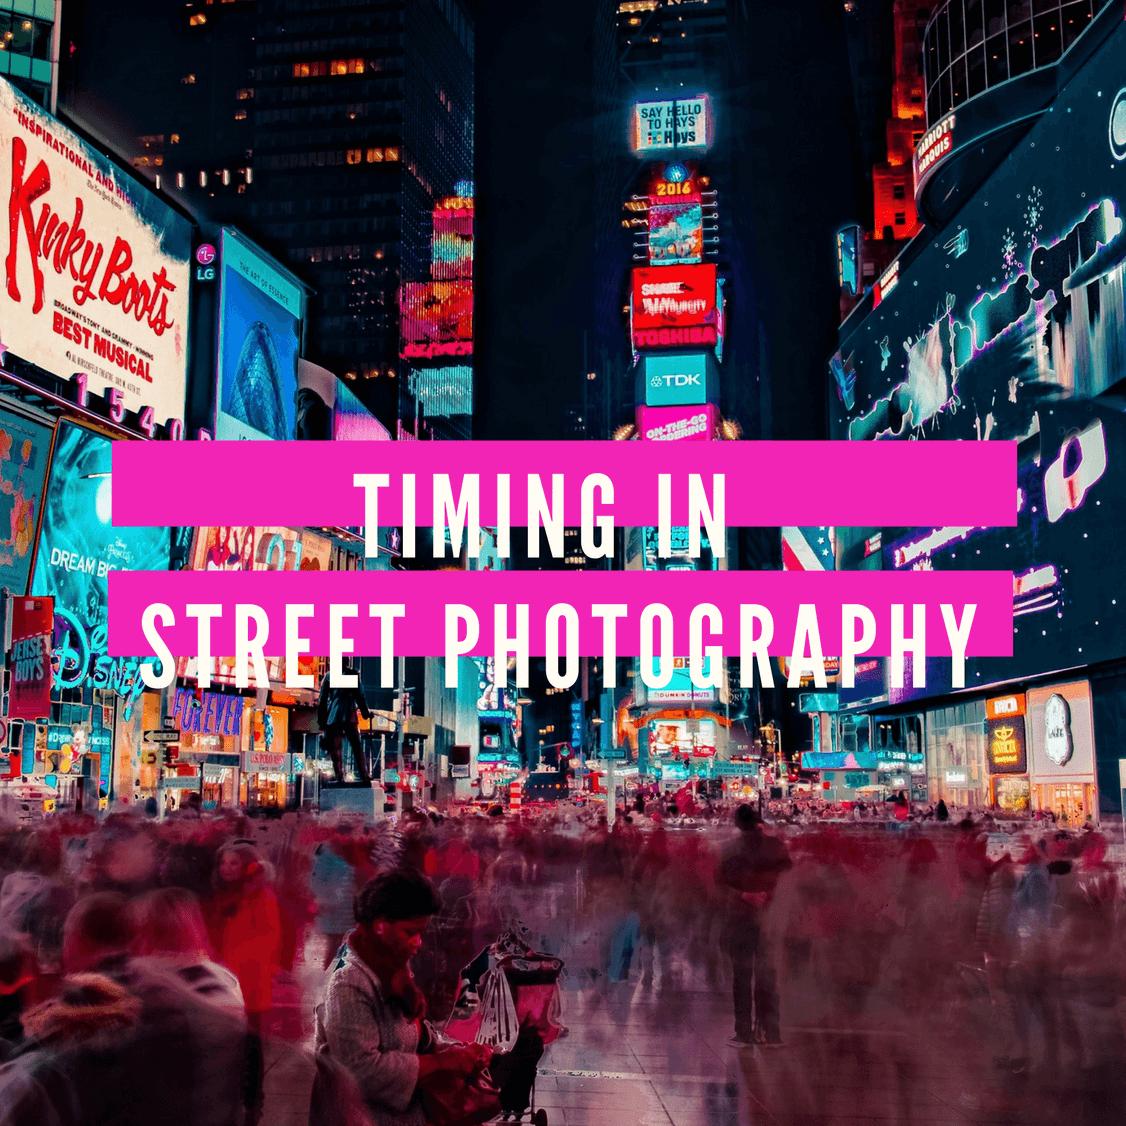 Street Photography Canva